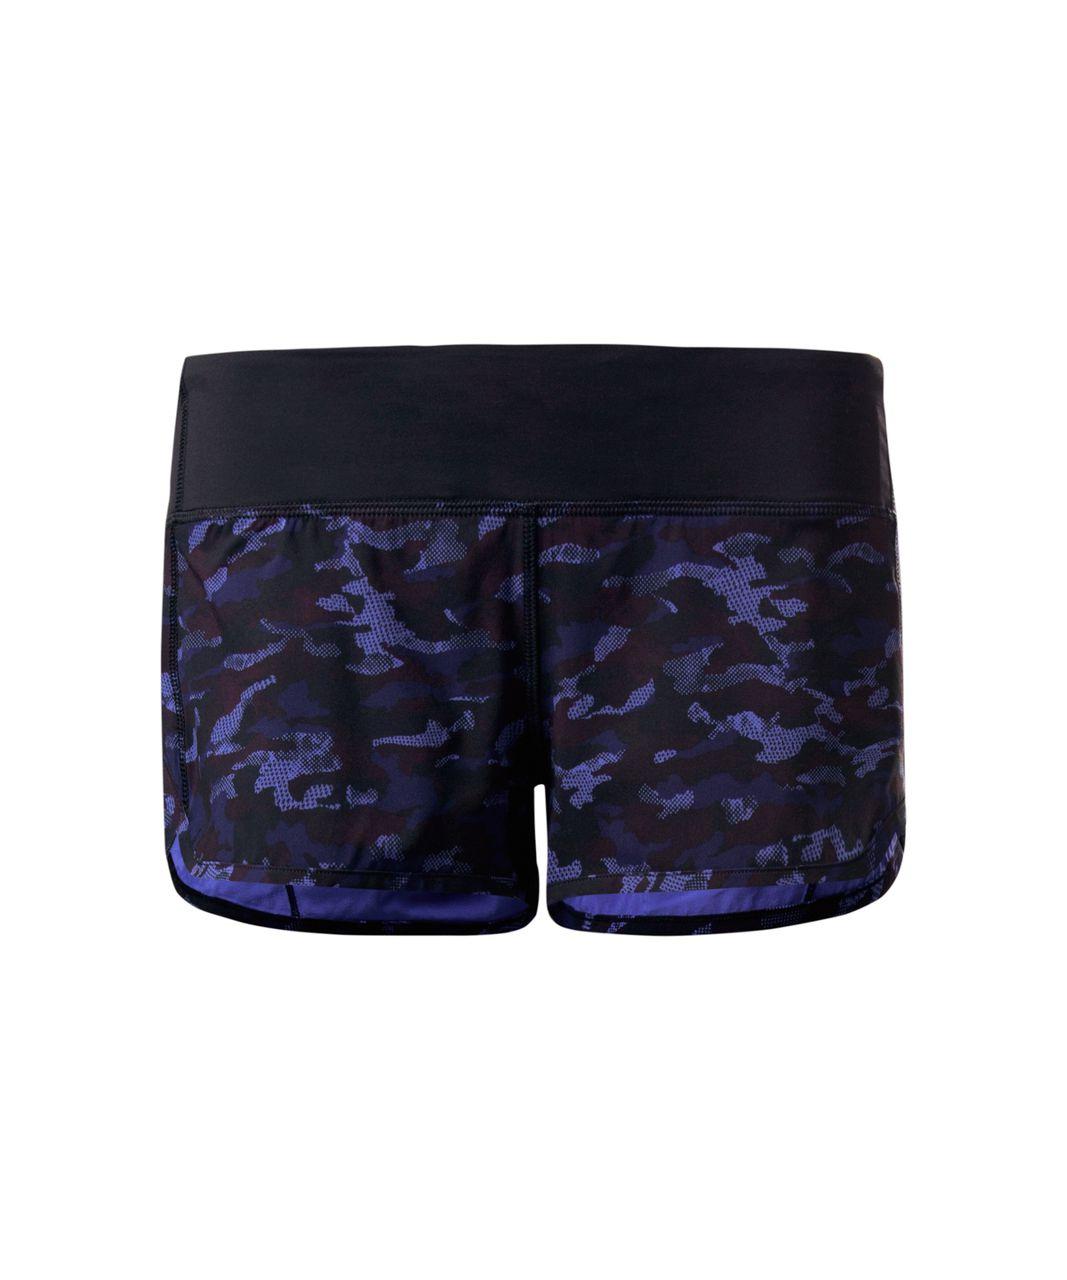 Lululemon Speed Short - Mini Hounds Camo Emperor Blue Black / Black